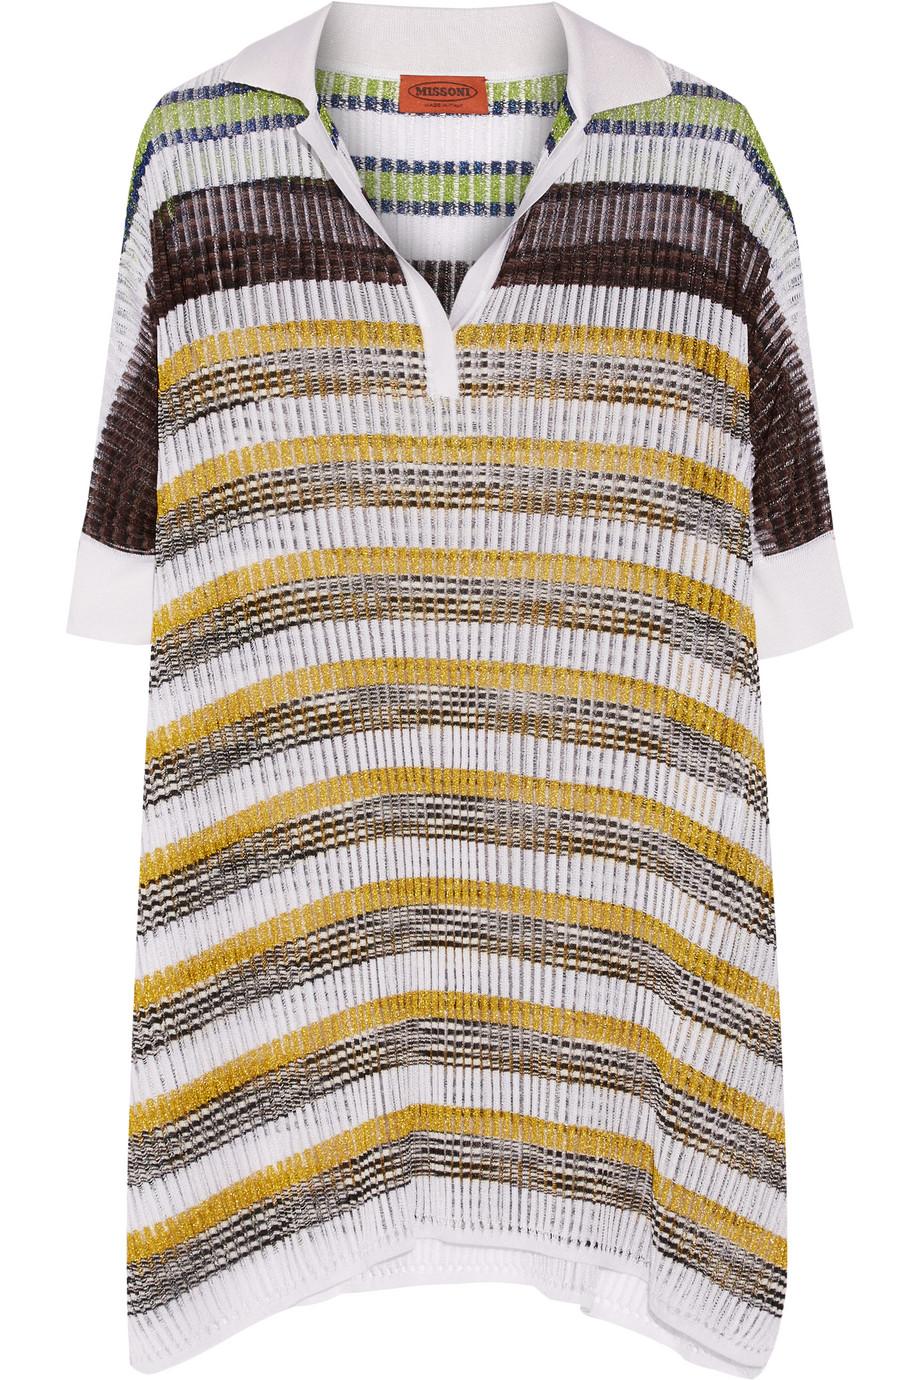 Missoni Oversized Metallic-Striped Crochet-Knit Top, White/Saffron, Women's